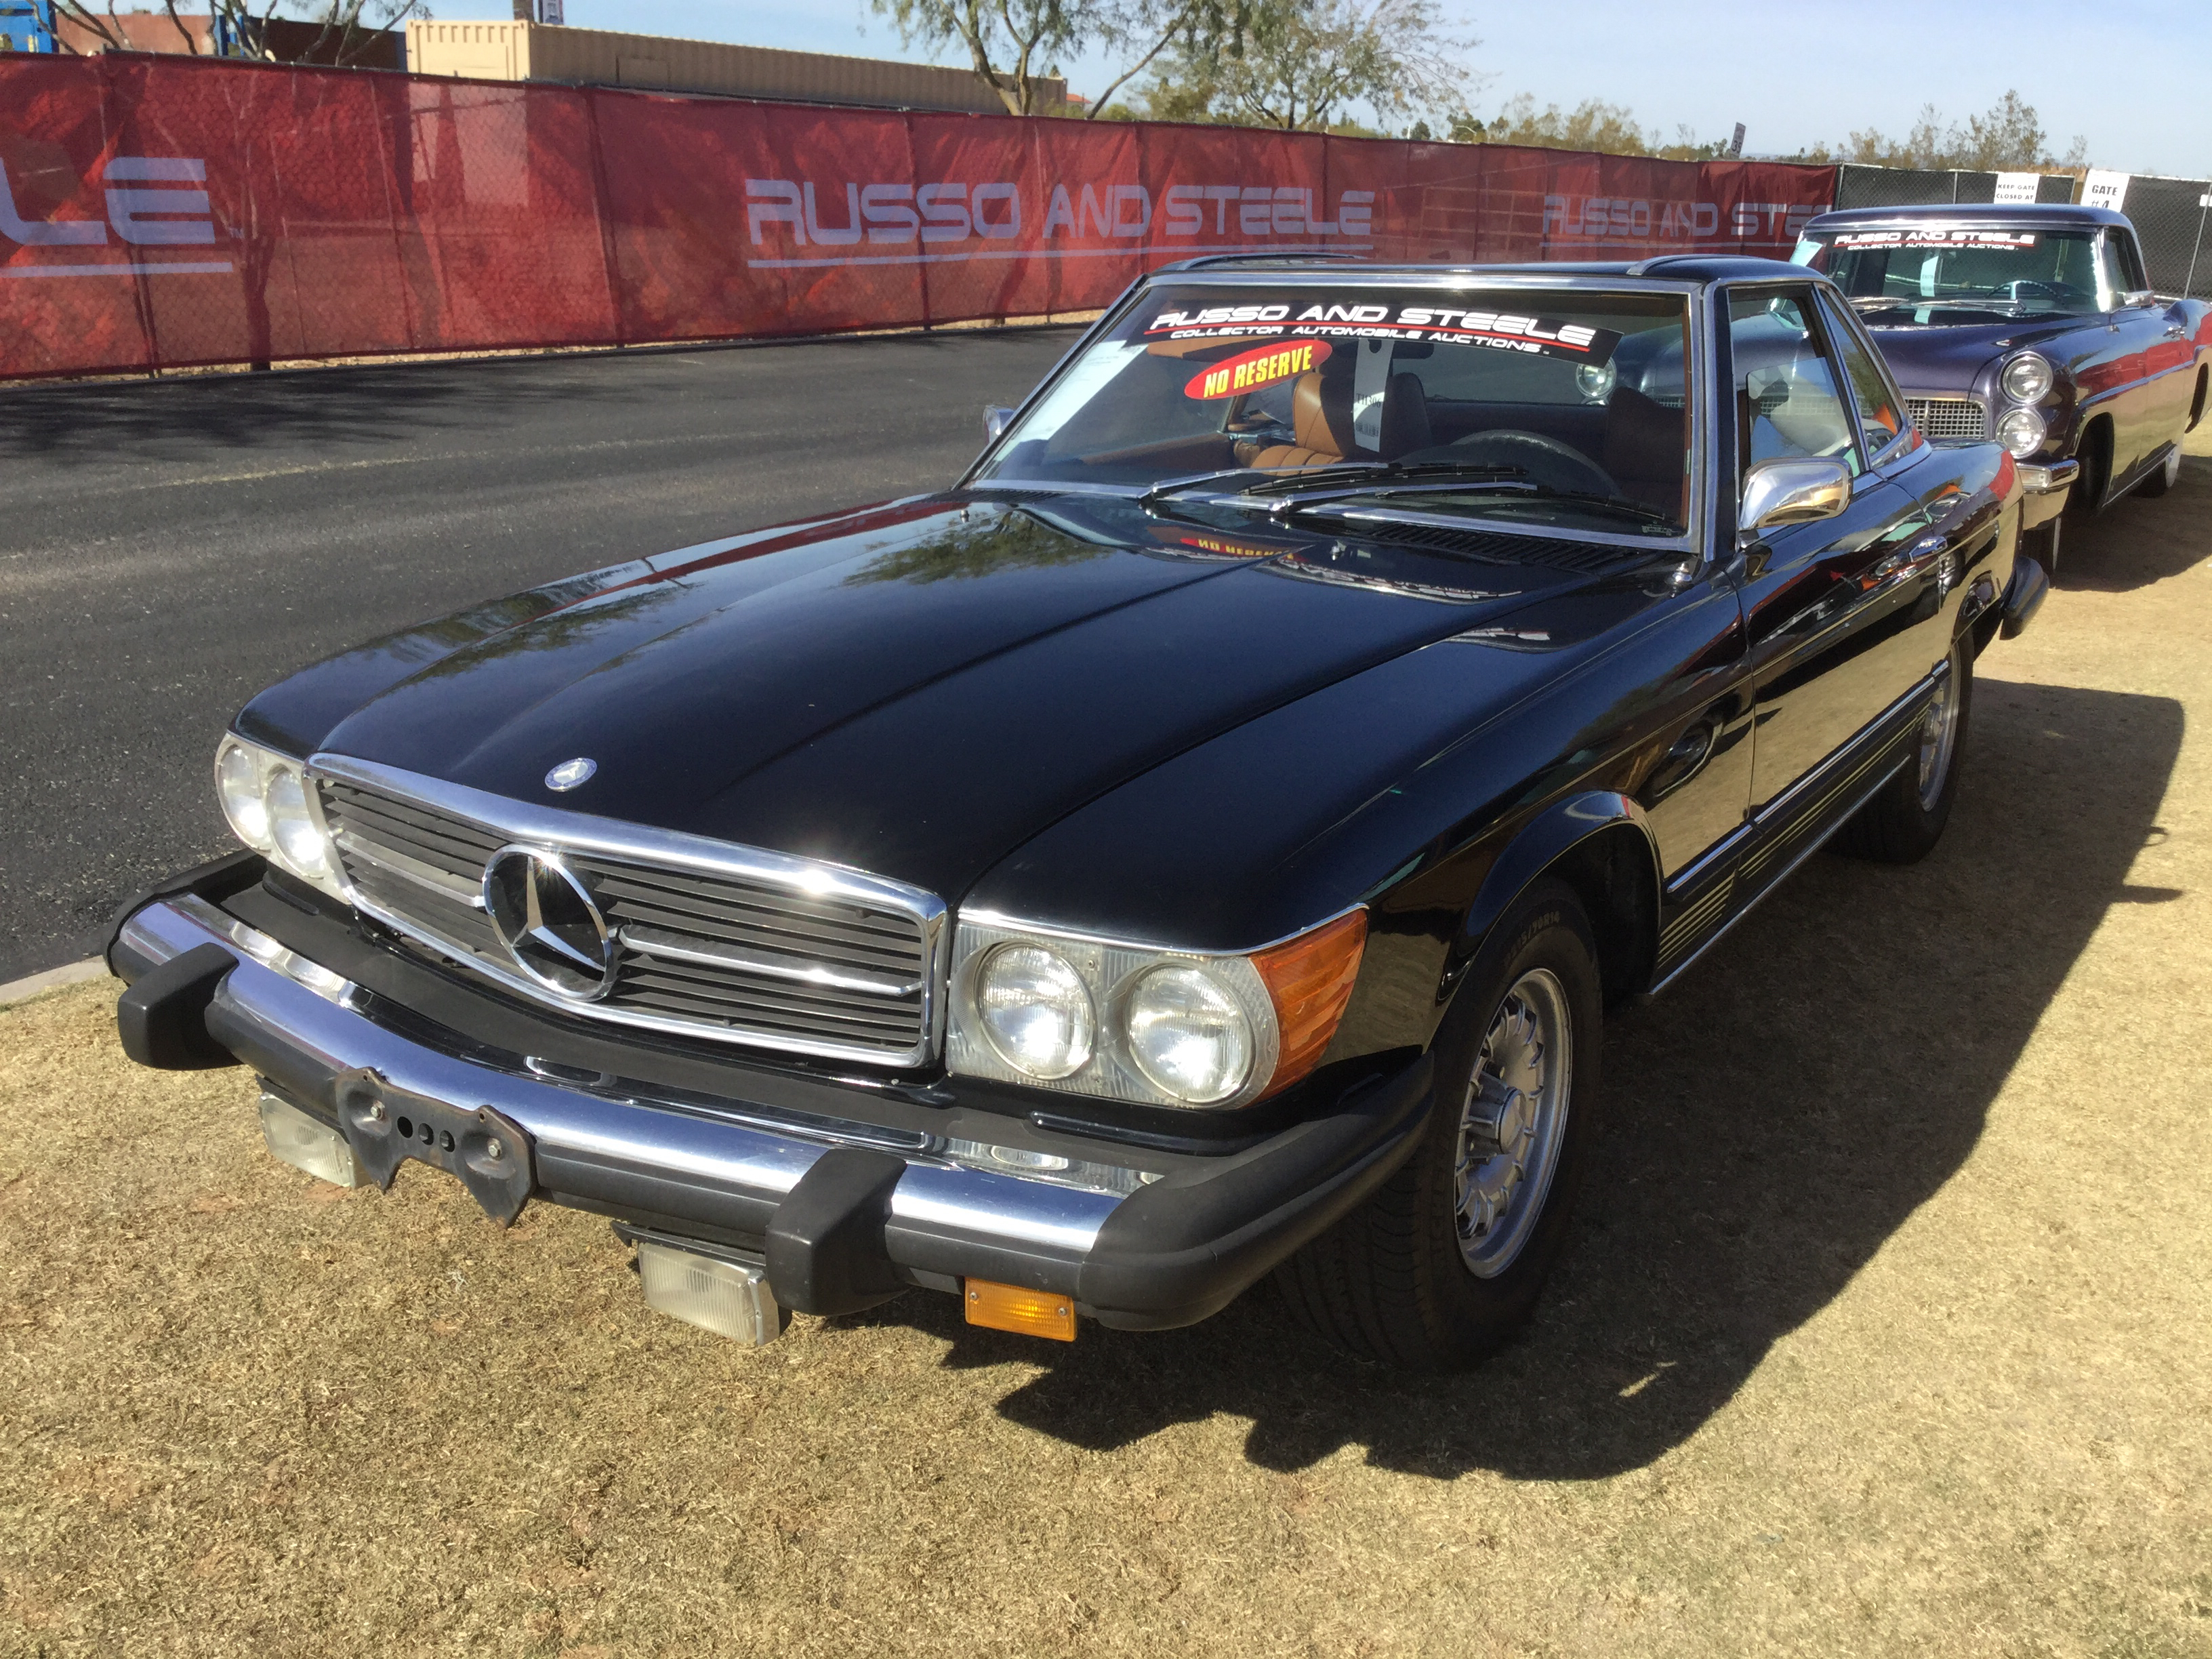 1974 Mercedes-Benz 450SL Values | Hagerty Valuation Tool®